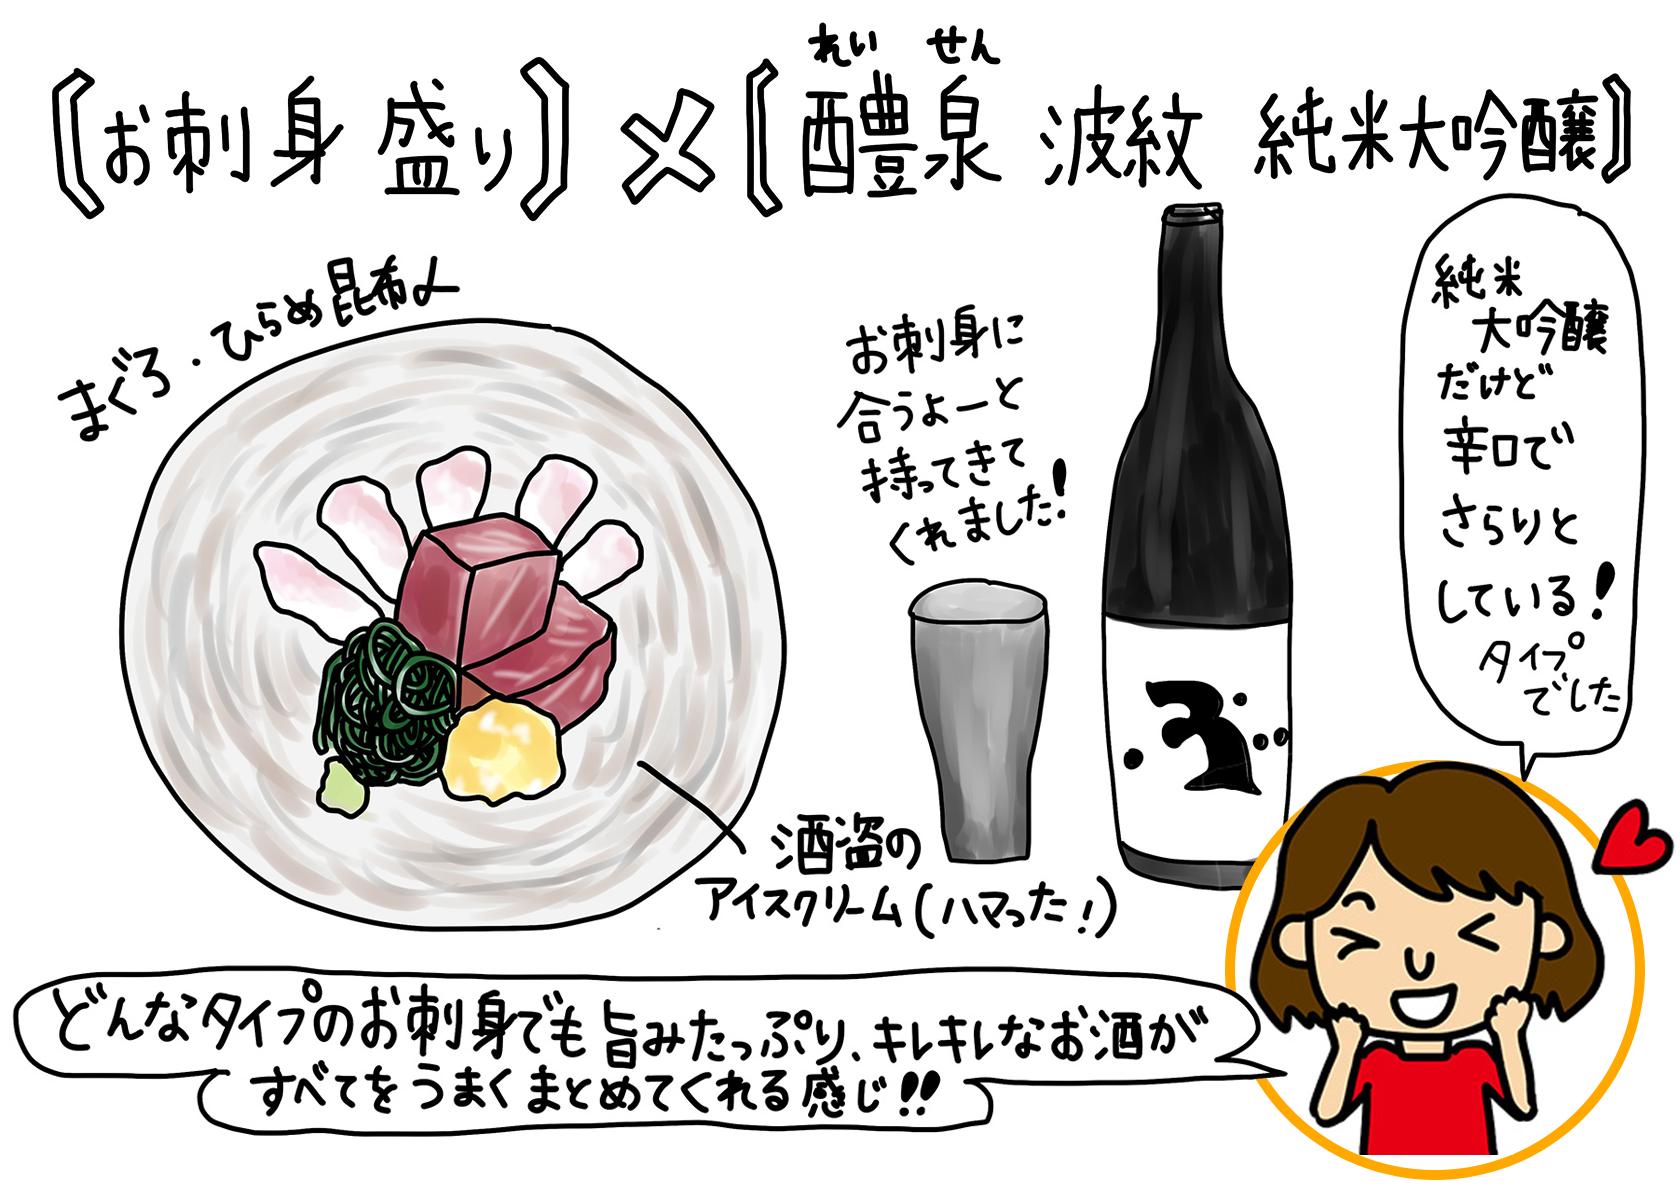 お刺身盛り×醴泉 波紋 純米大吟醸